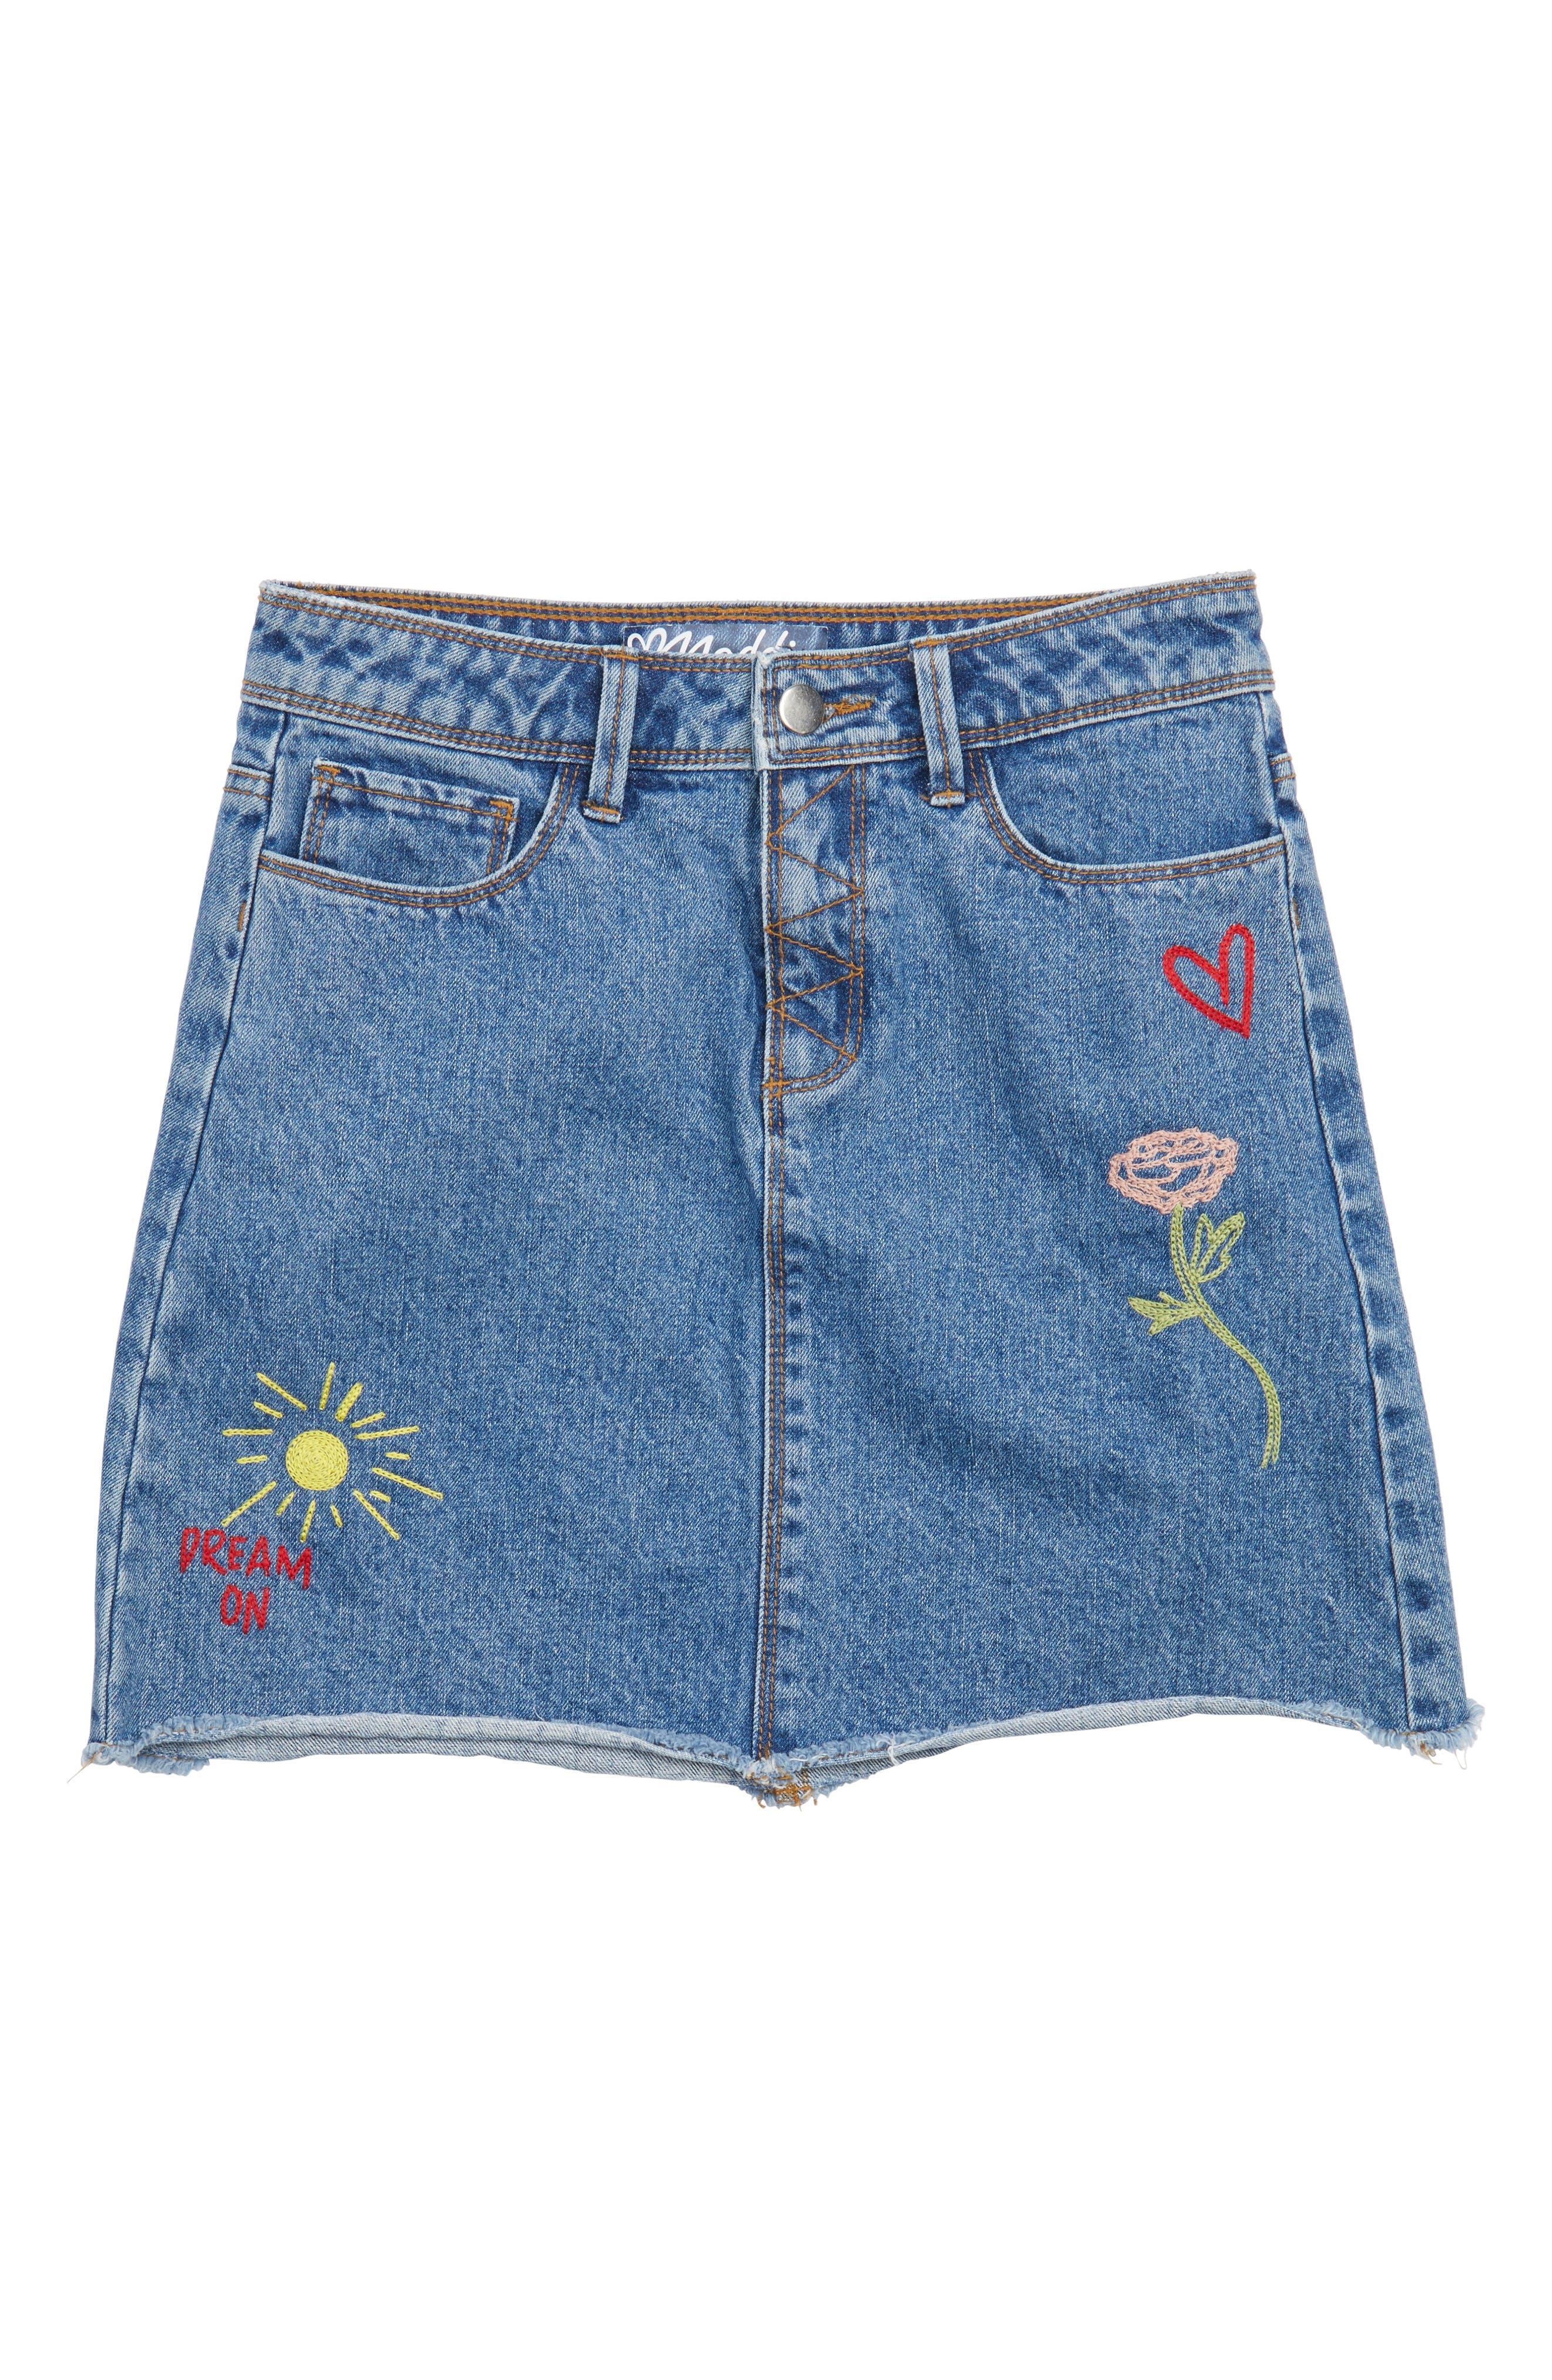 Alternate Image 1 Selected - Maddie Embroidered Denim Skirt (Big Girls)